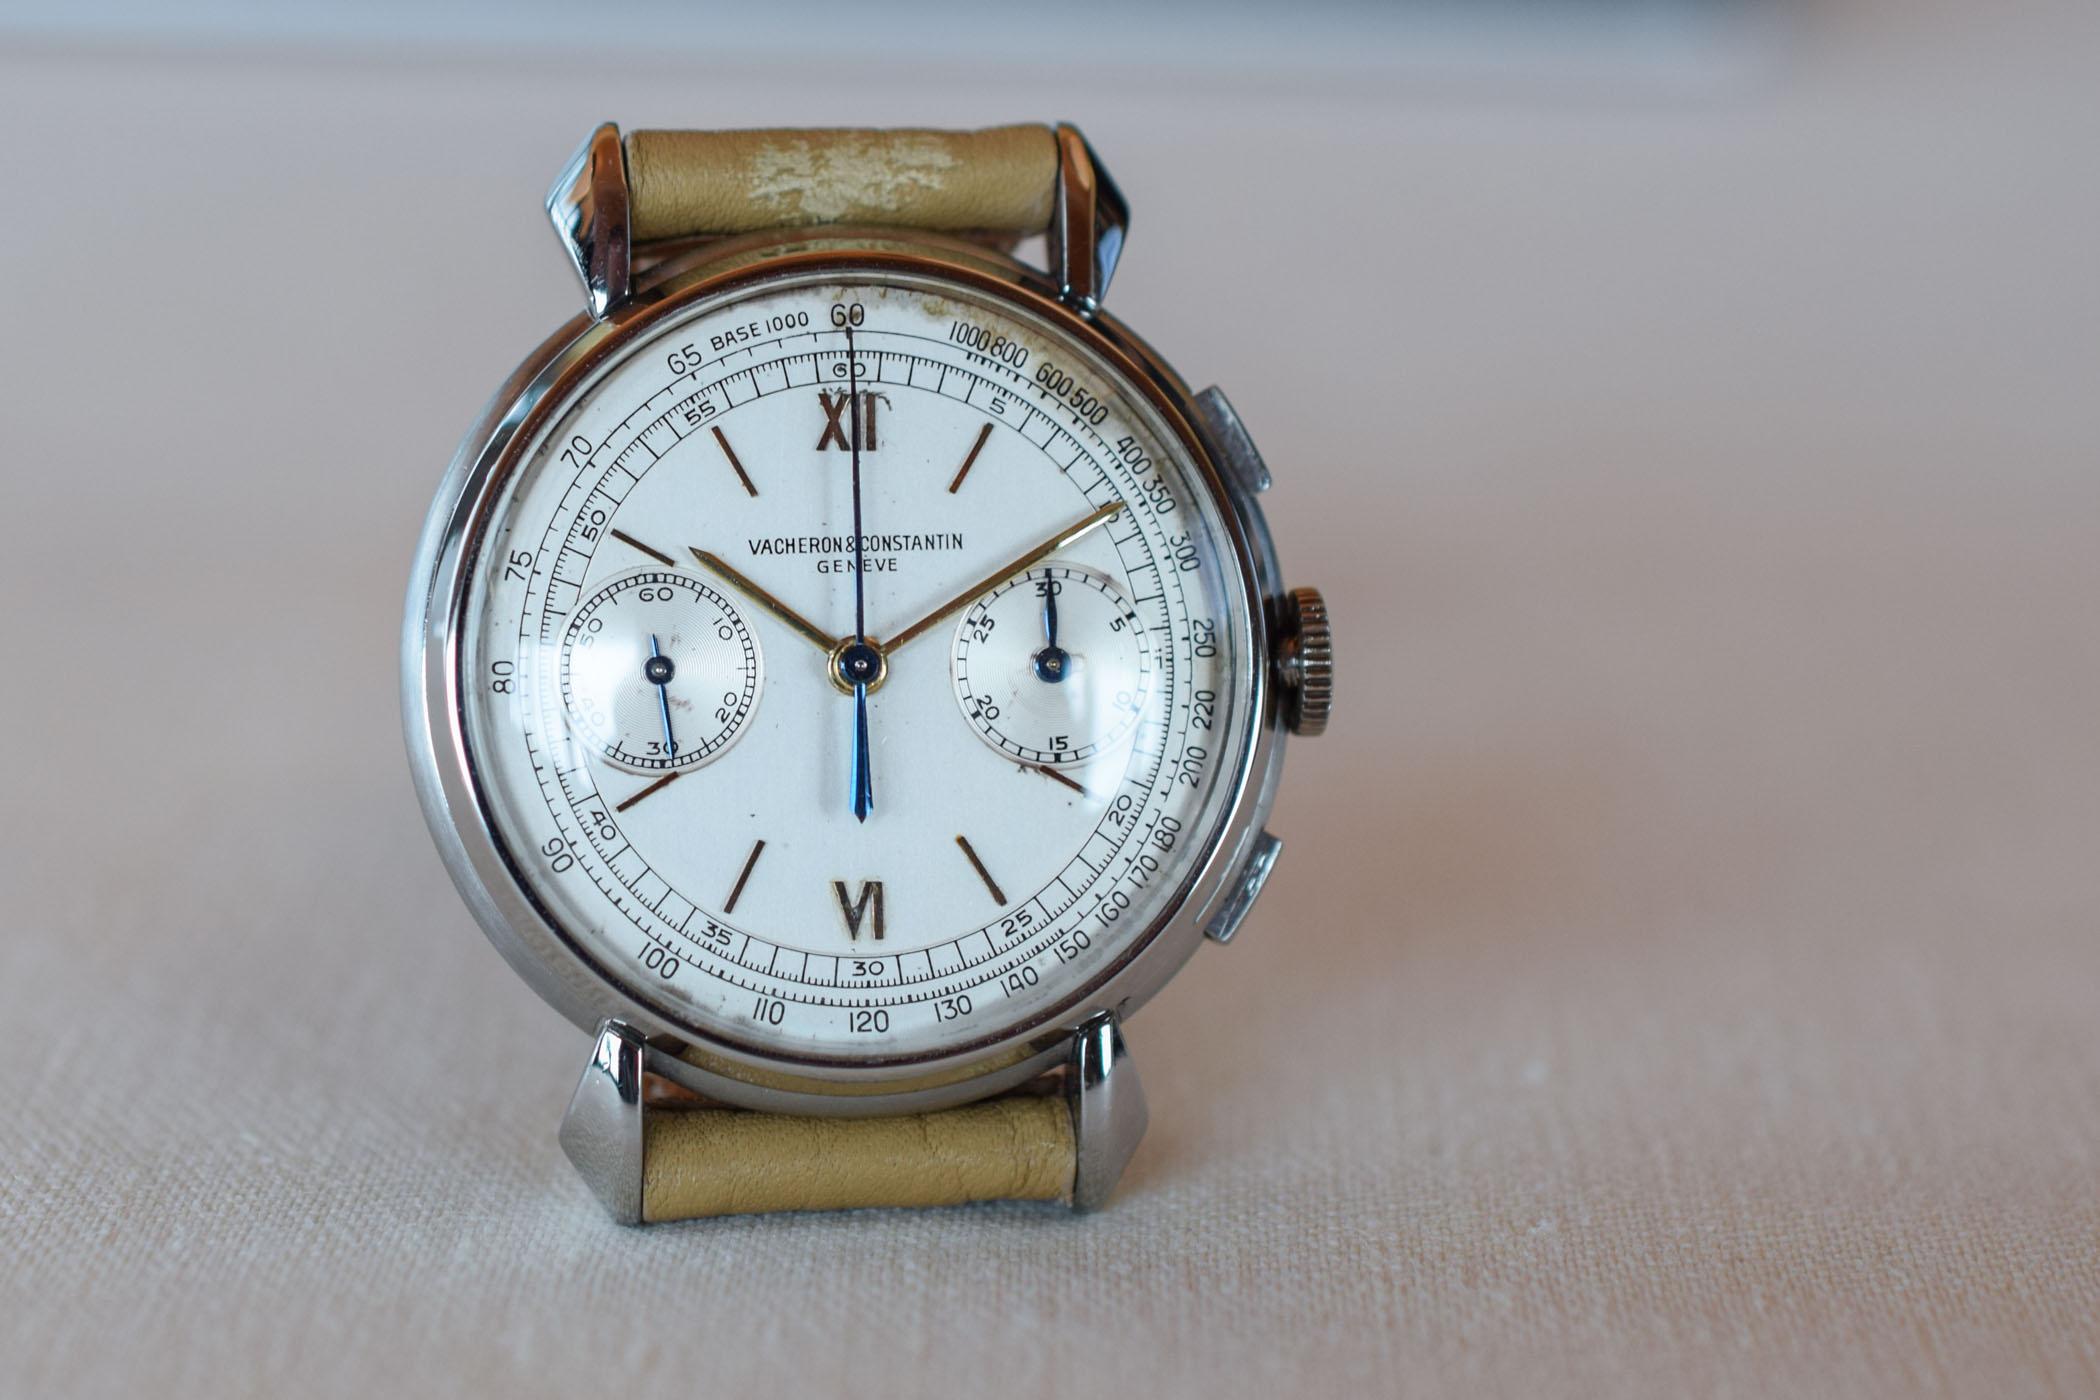 Vacheron Constantin Chronograph reference 4178